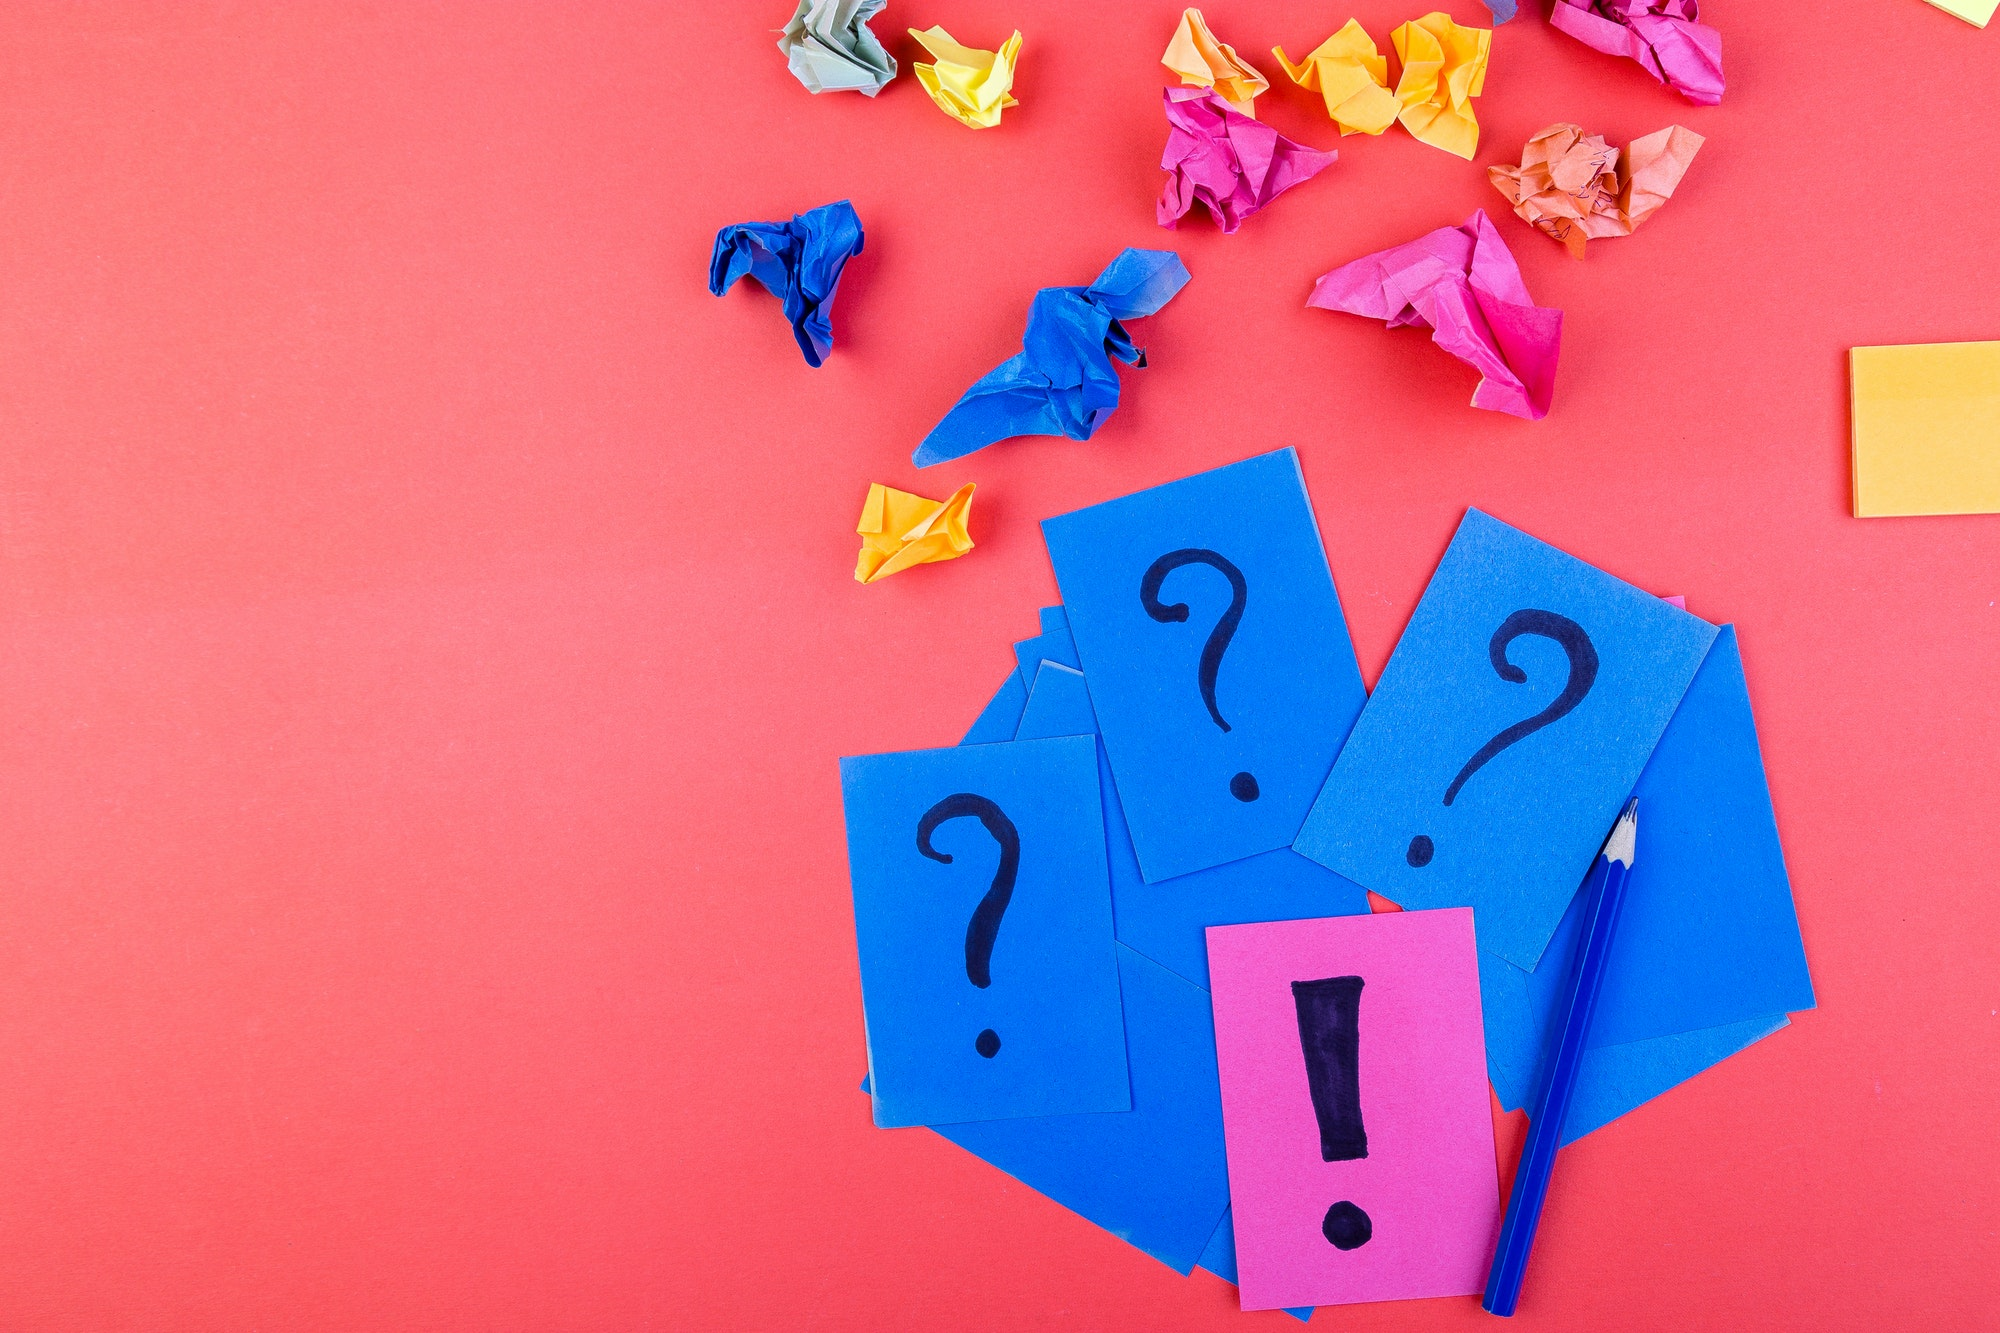 Concept in search ideas. Creased paper of idea. Falt lay